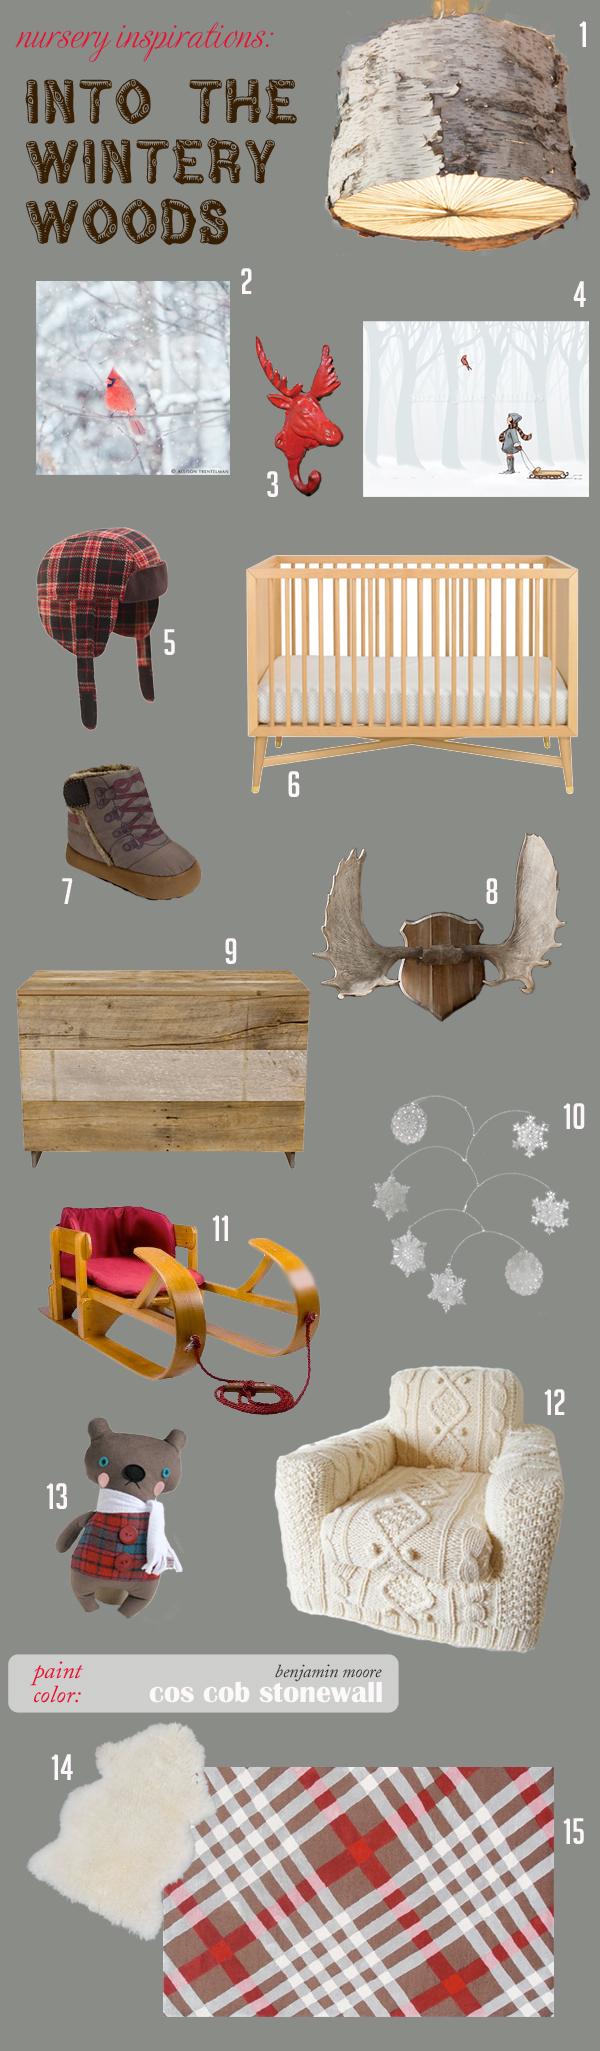 nursery-inspiration-board-into-the-wintery-woods